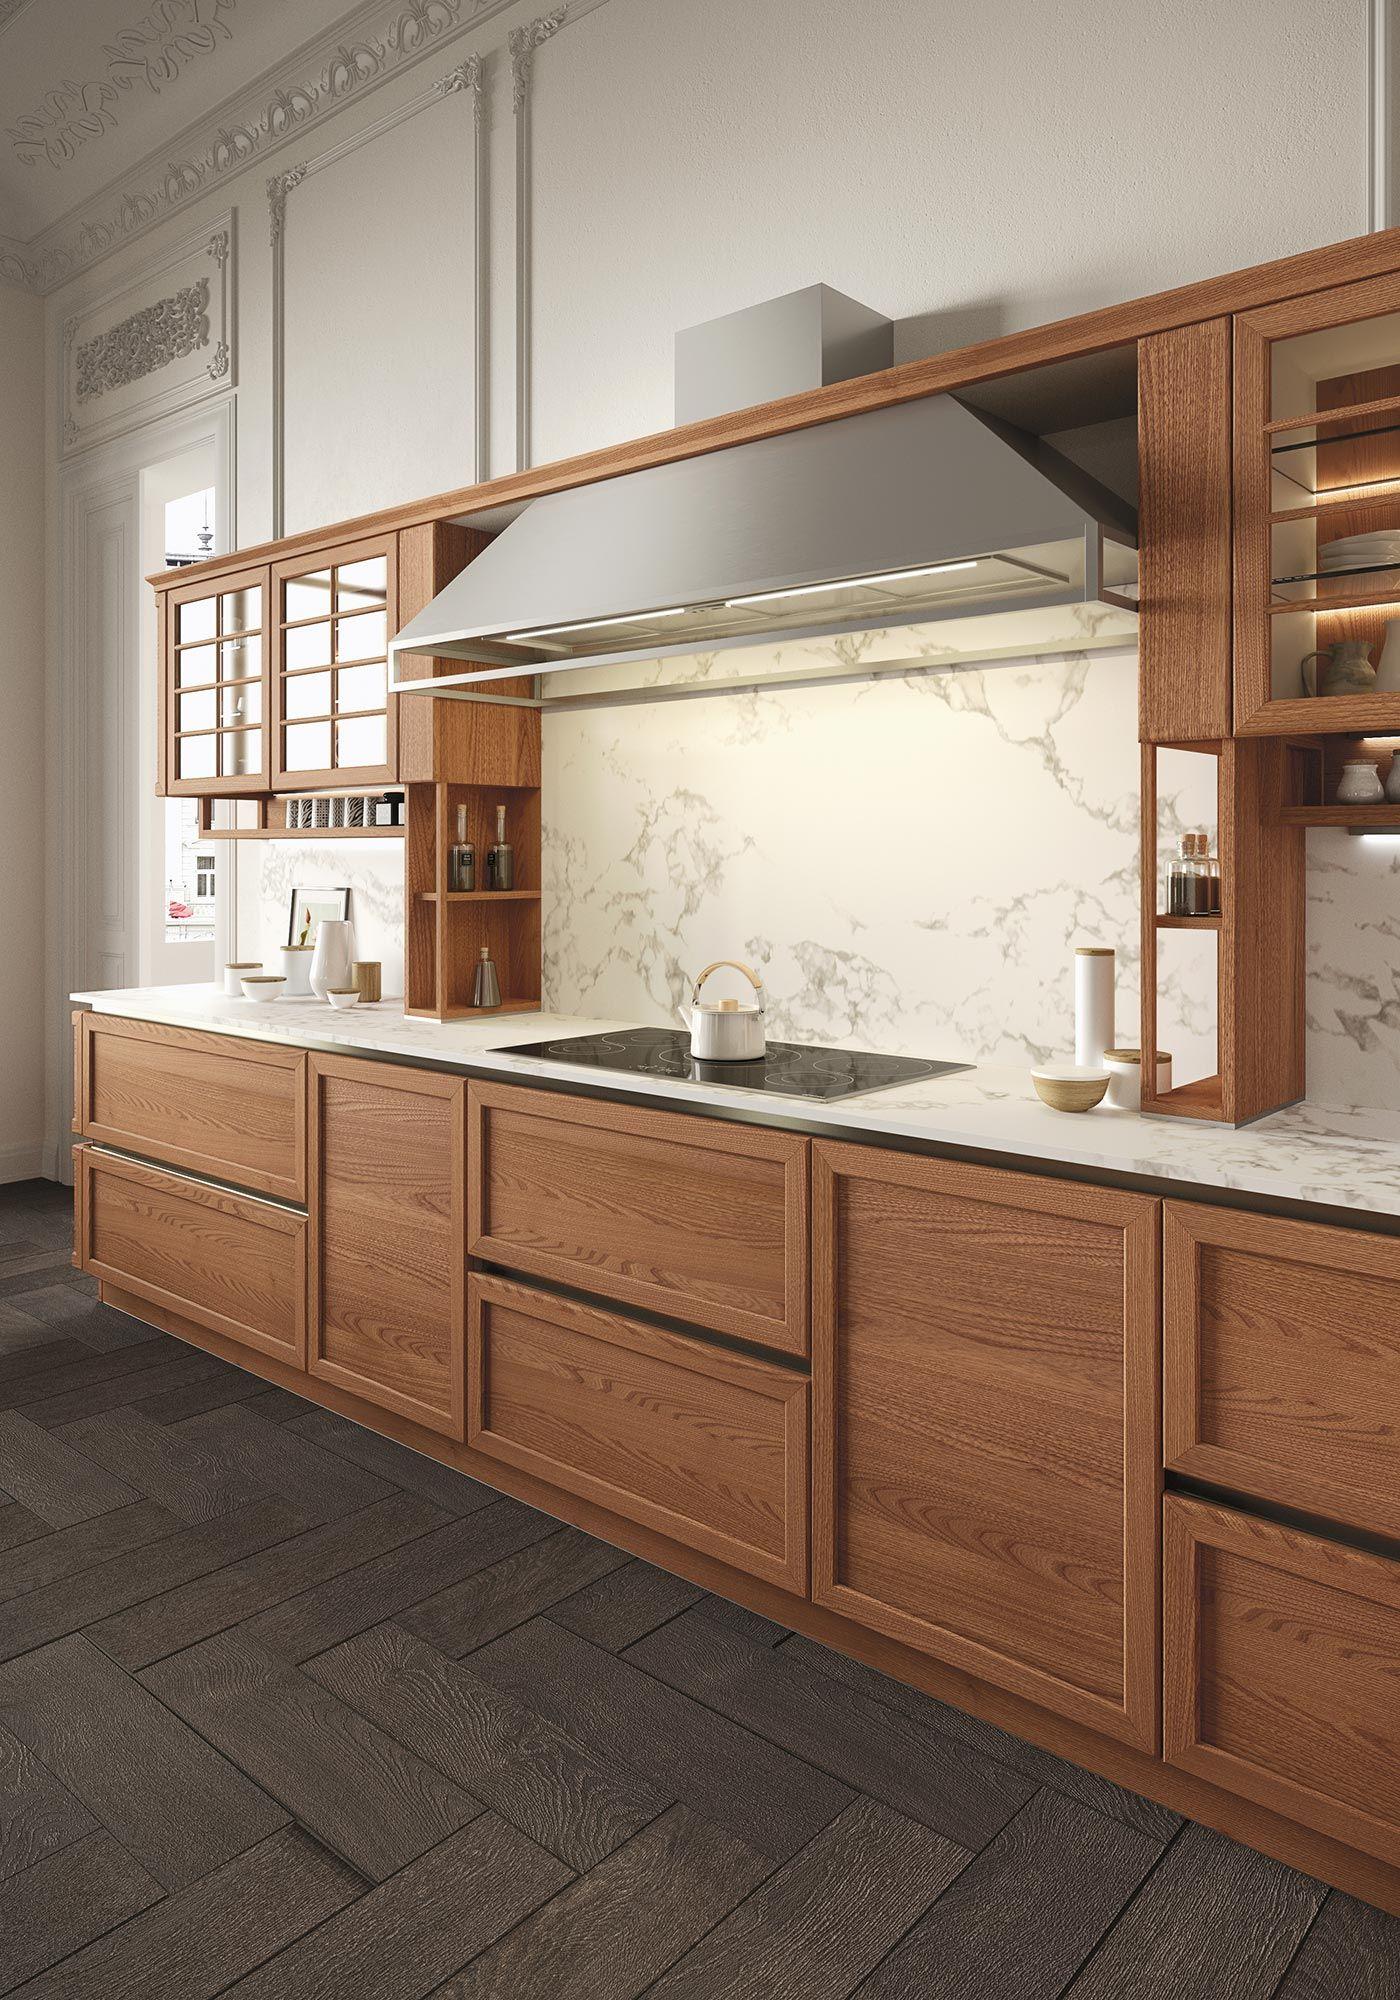 Heritage Italian Kitchen Design Modern Kitchen Design Interior Design Kitchen